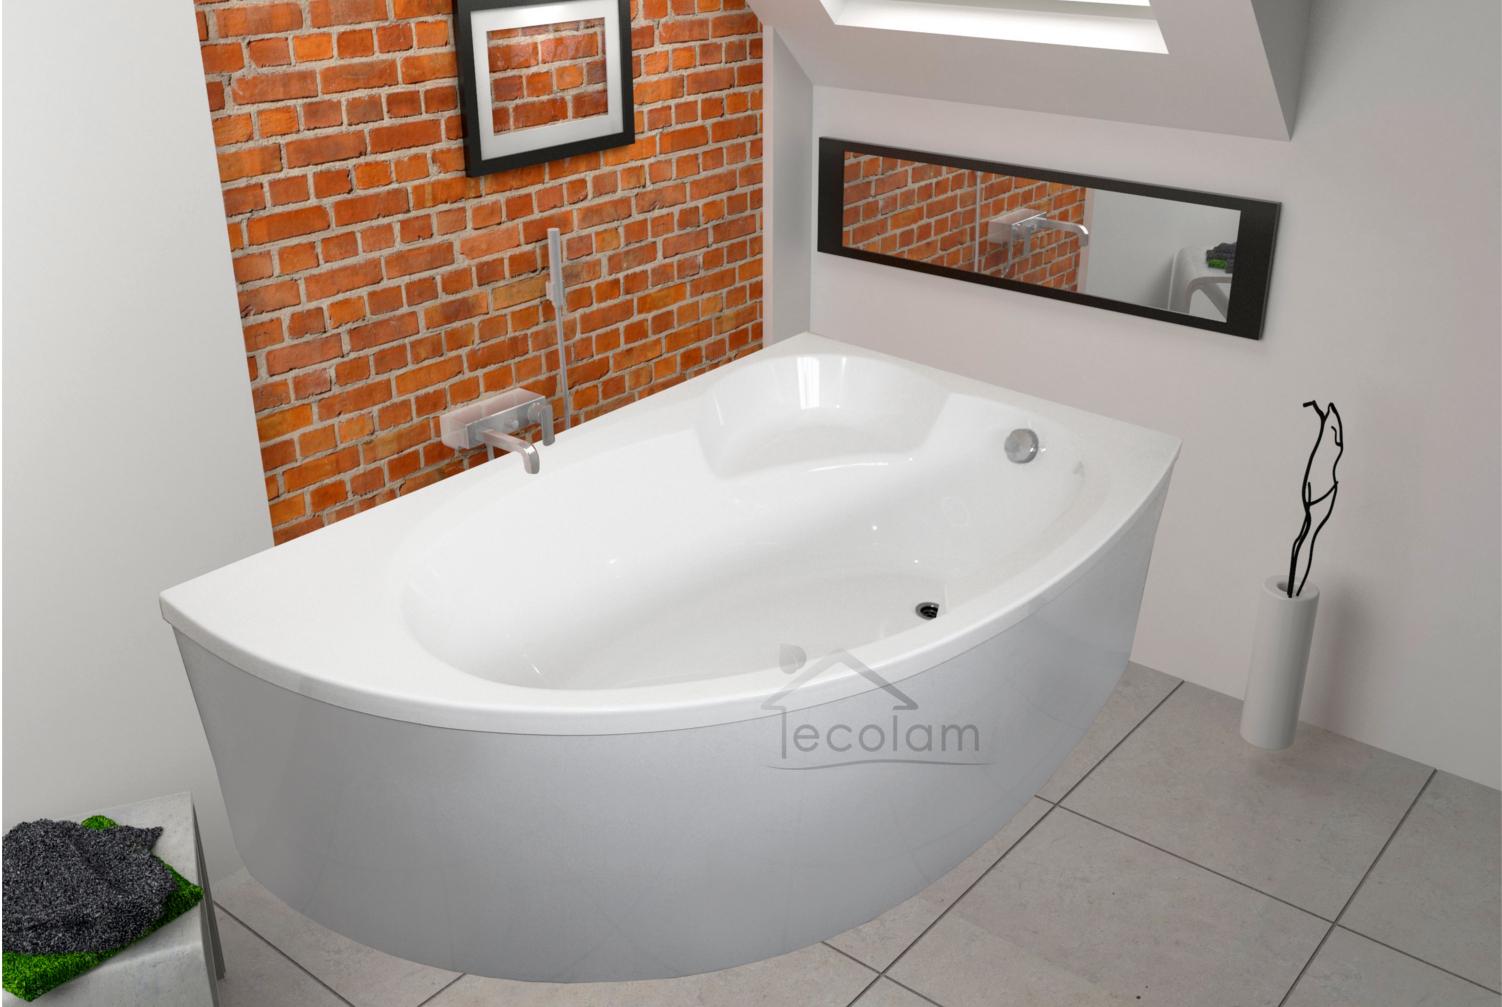 badewanne wanne acryl eckbadewanne 170 x 100 cm sch rze. Black Bedroom Furniture Sets. Home Design Ideas